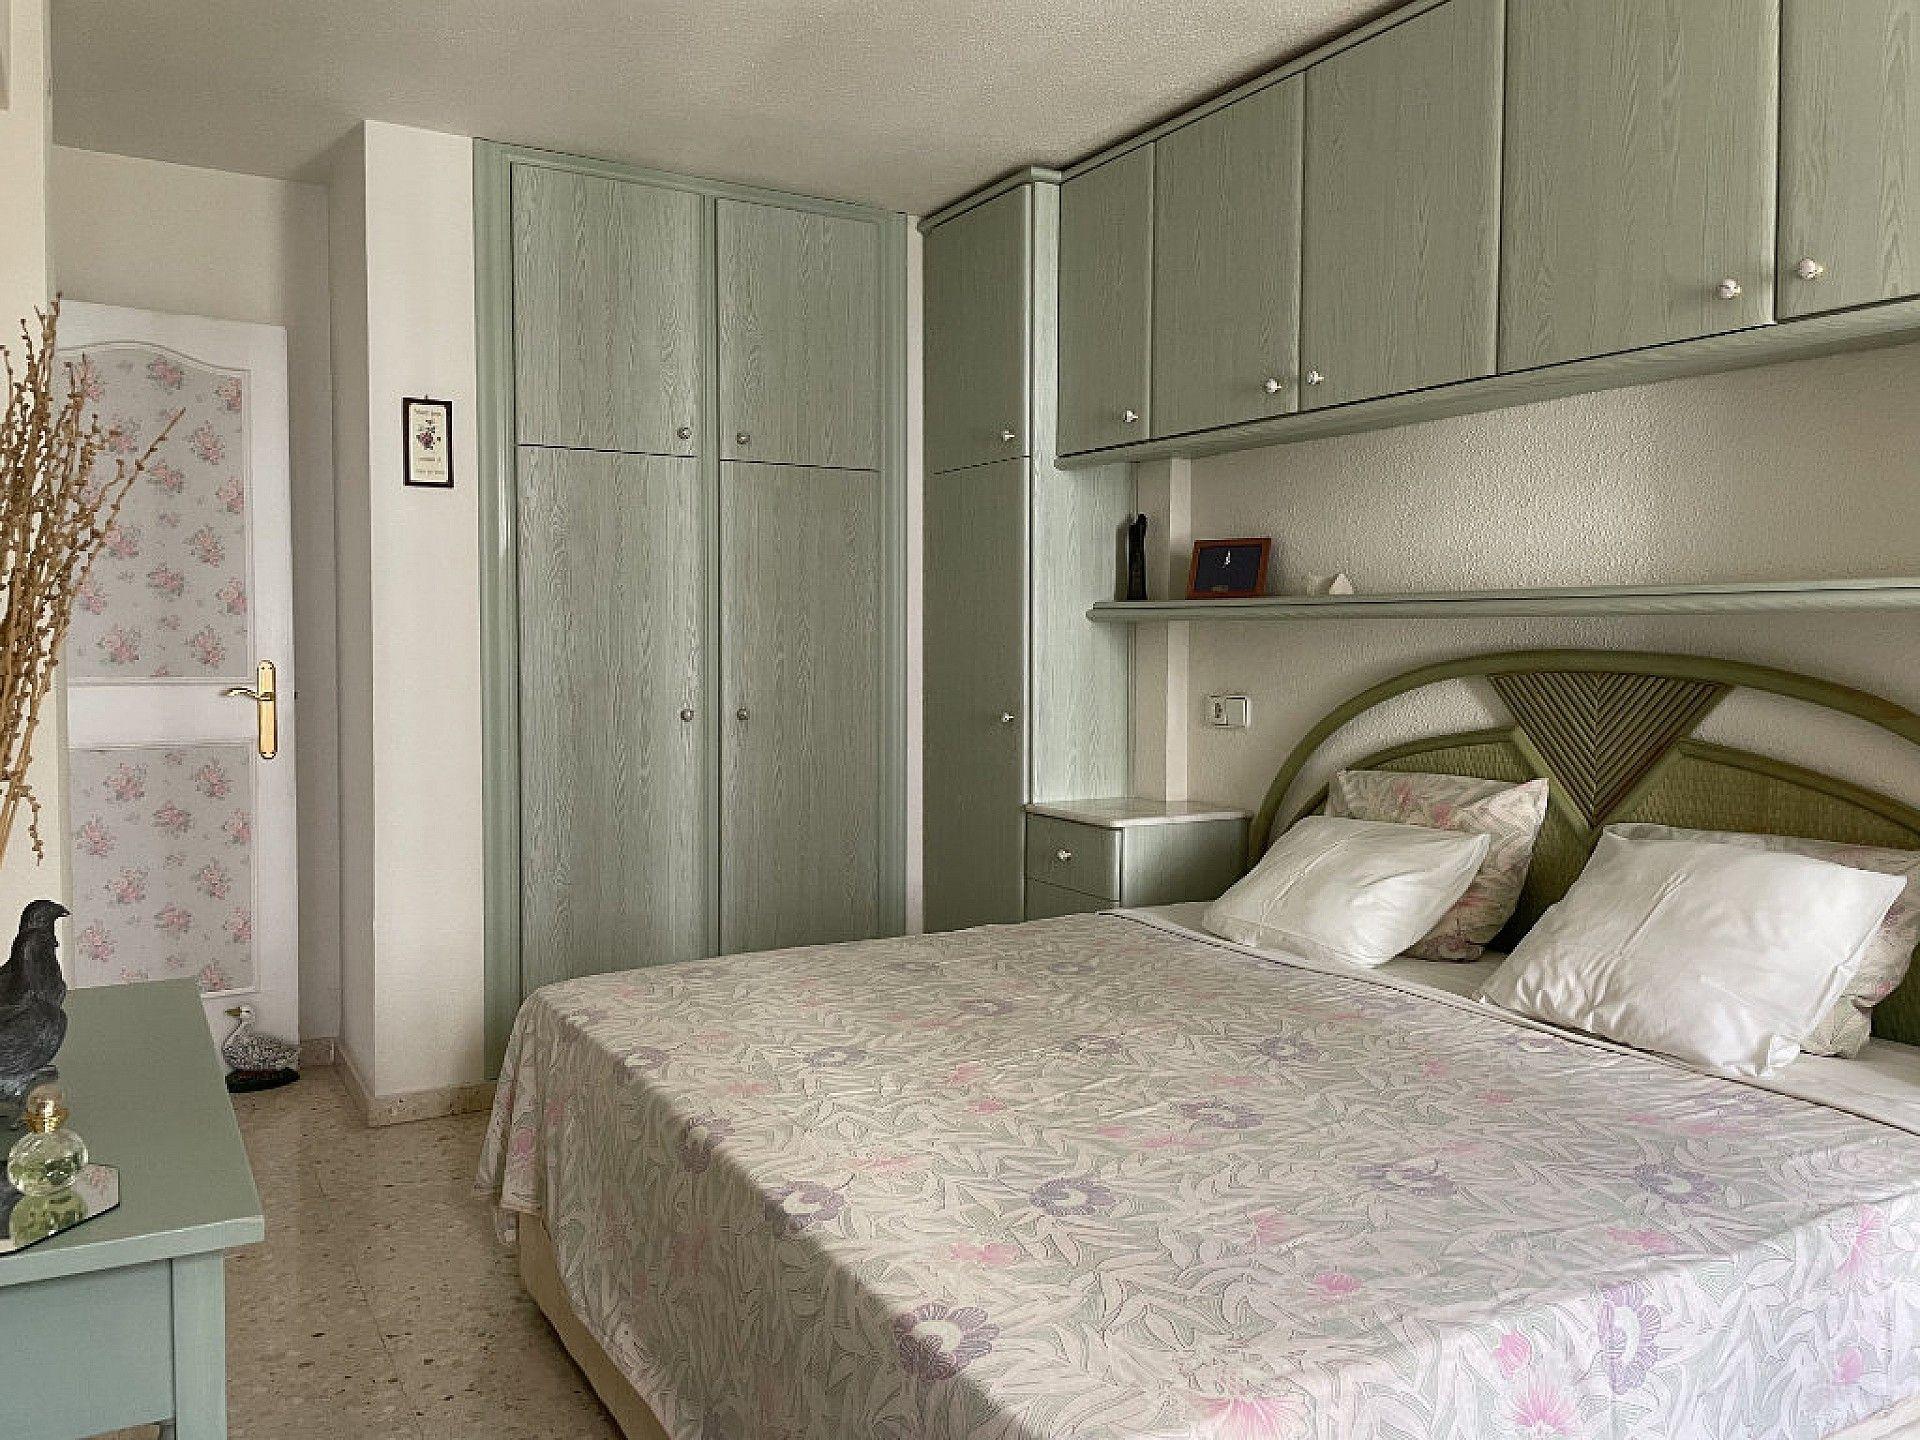 w_appartement-tekoop-costa-blanca-calpe-a1068-spanje15.jpg